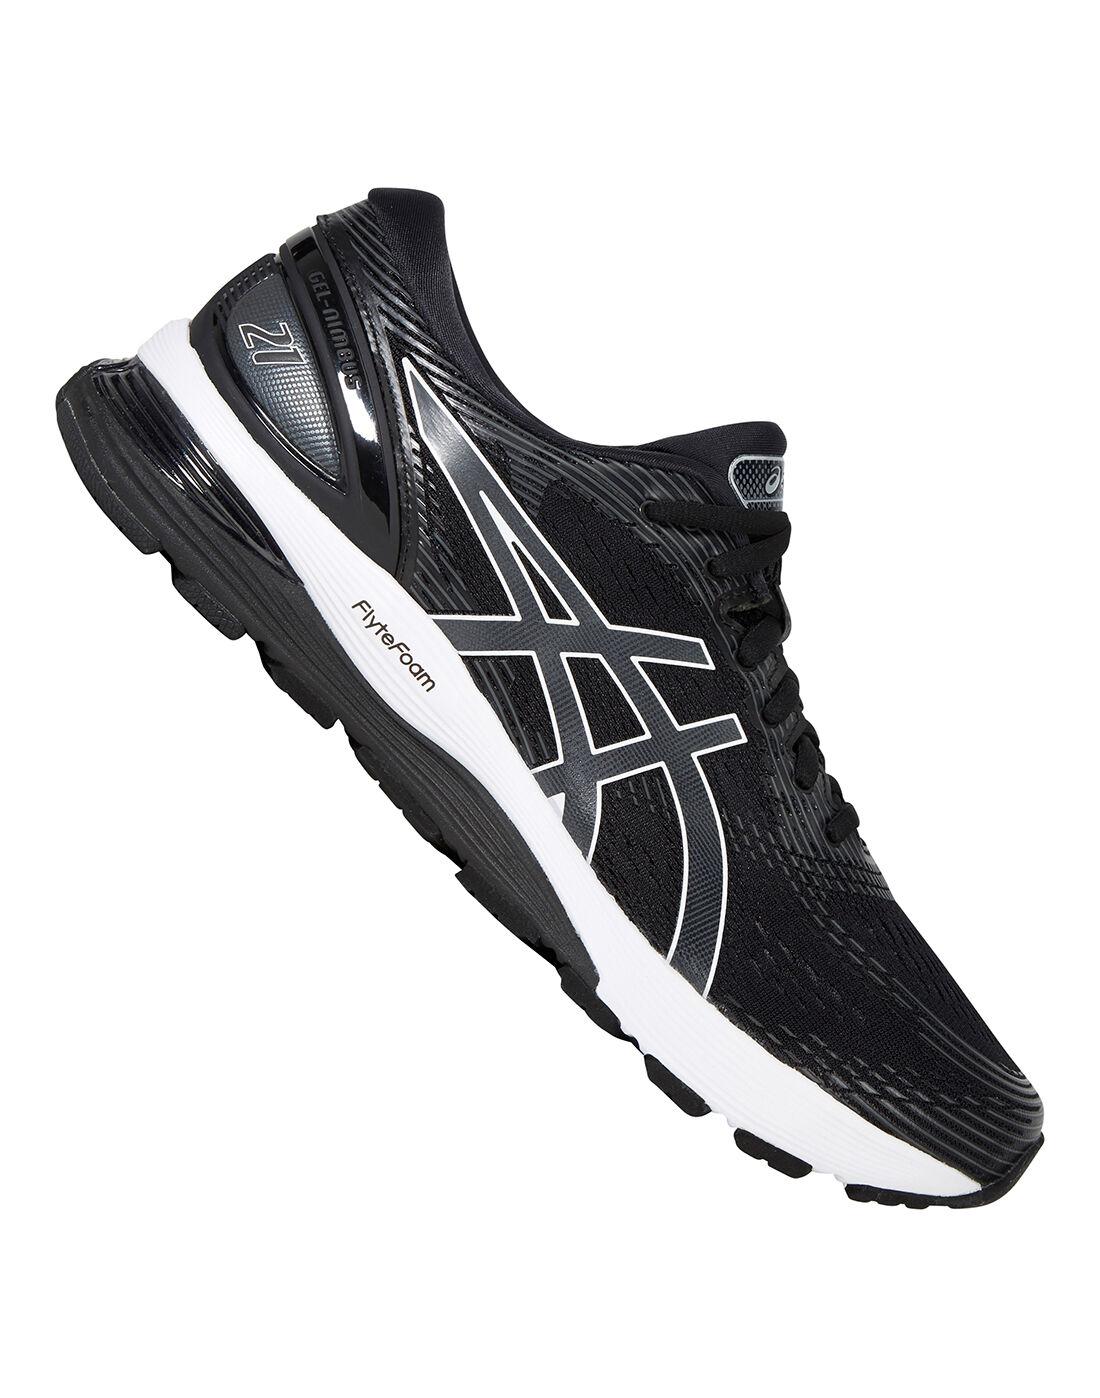 Pour Shoes Gel Black Running Asics Nimbus Mens Chaussures 21 Homme wOP08Xkn